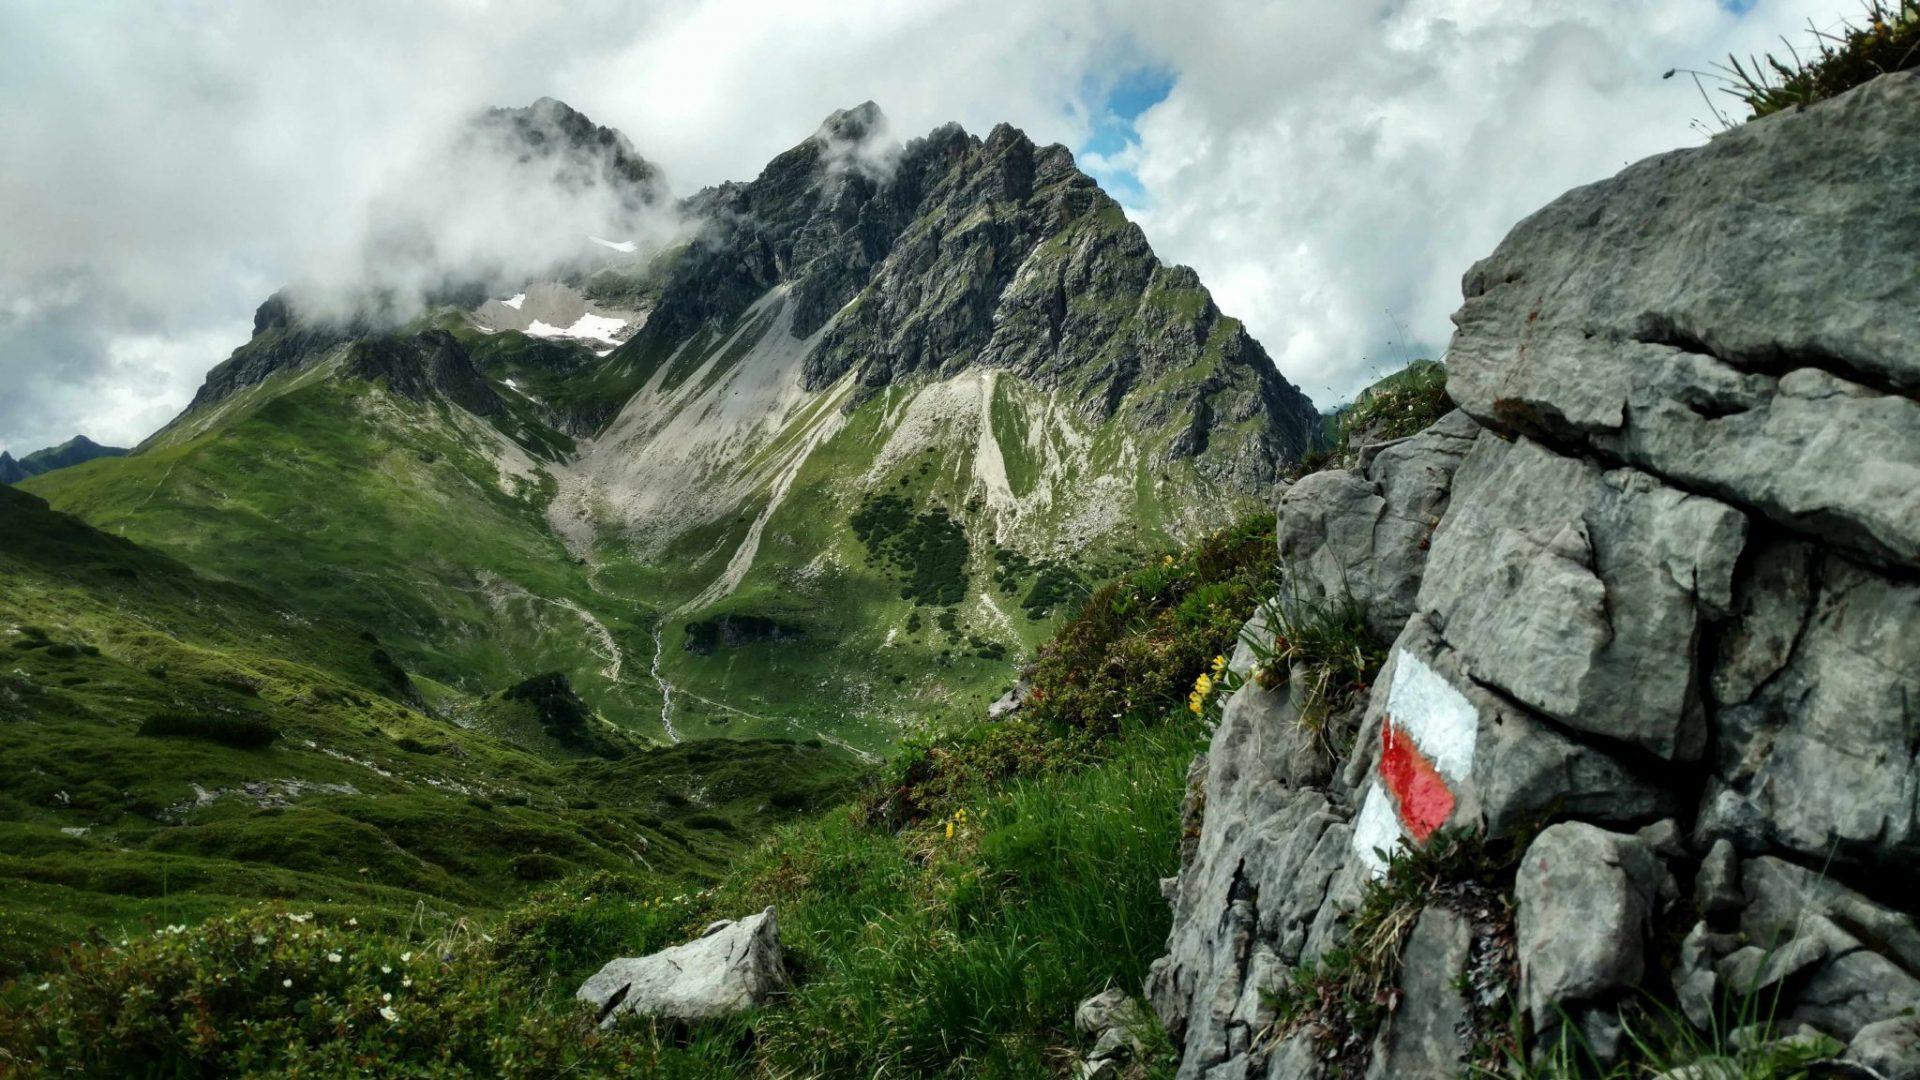 BLOG | Traversing the Austrian Alps on the Via Alpina